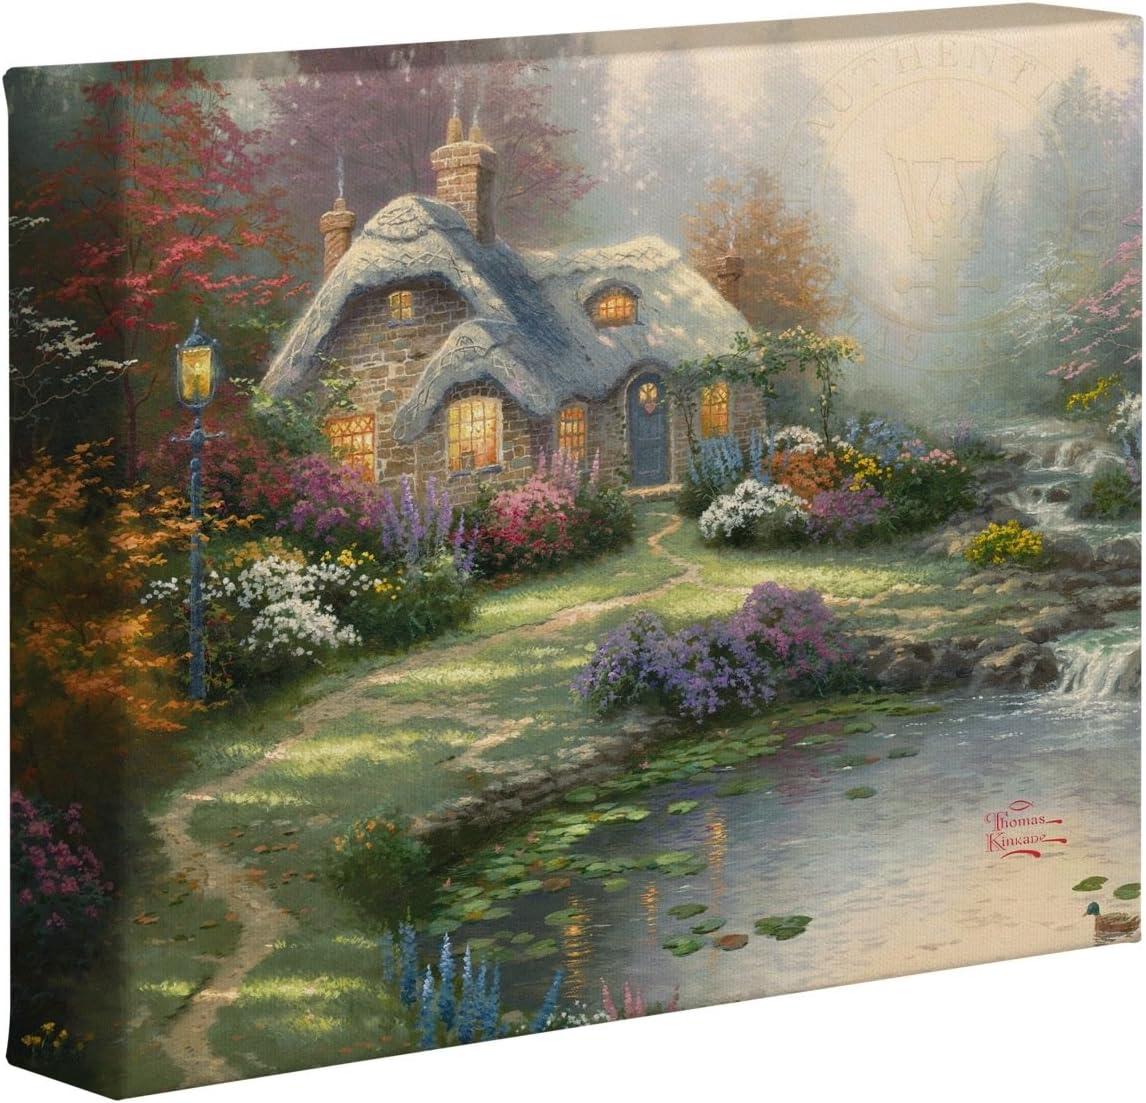 Thomas Kinkade Everett's Cottage 8 x 10 Gallery Wrapped Canvas